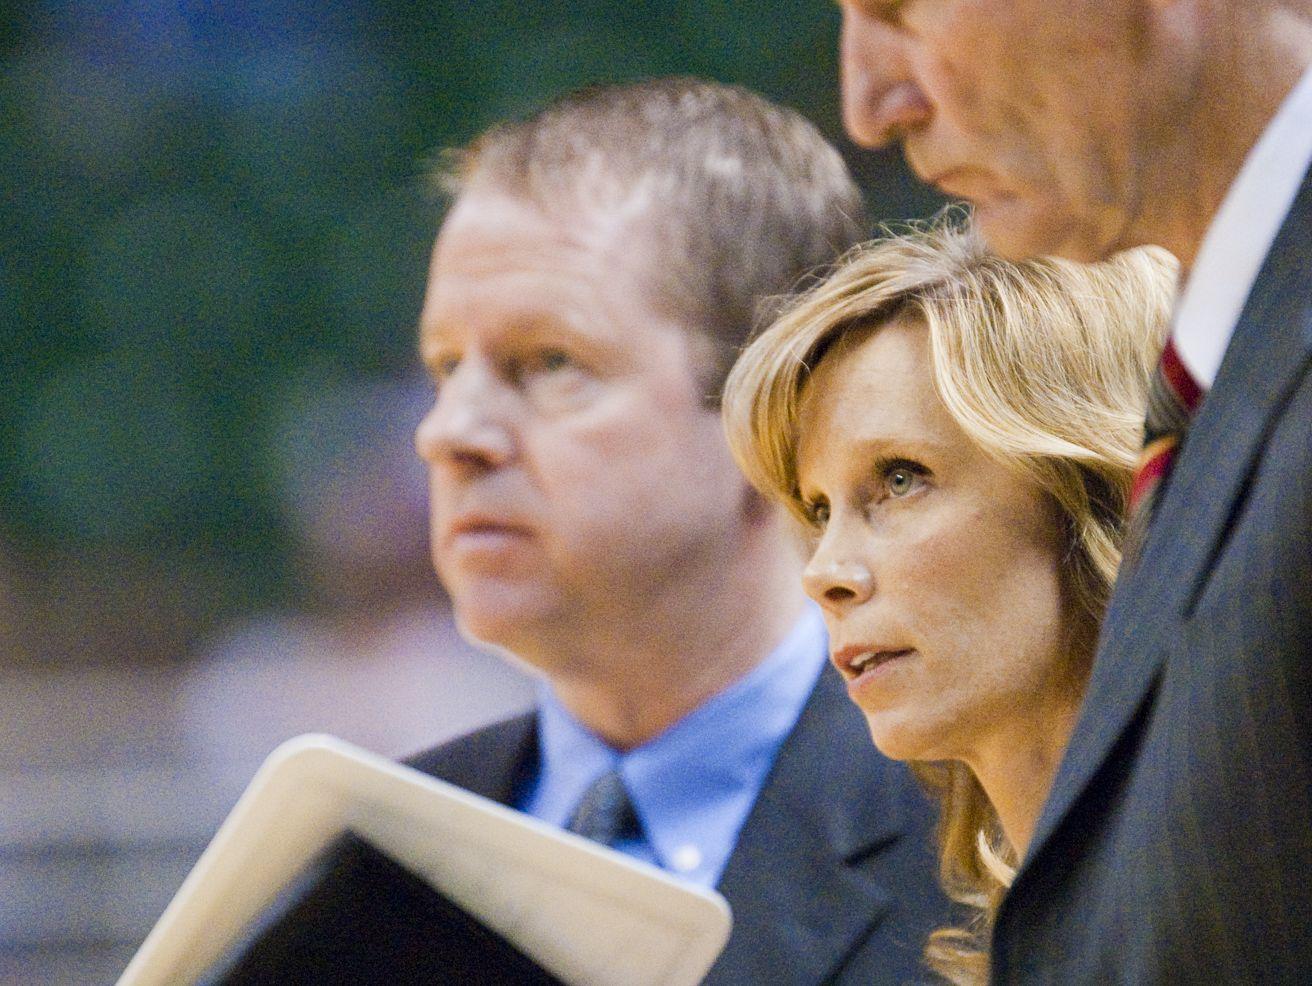 MSU Women's Basketball Head Coach Suzy Merchant